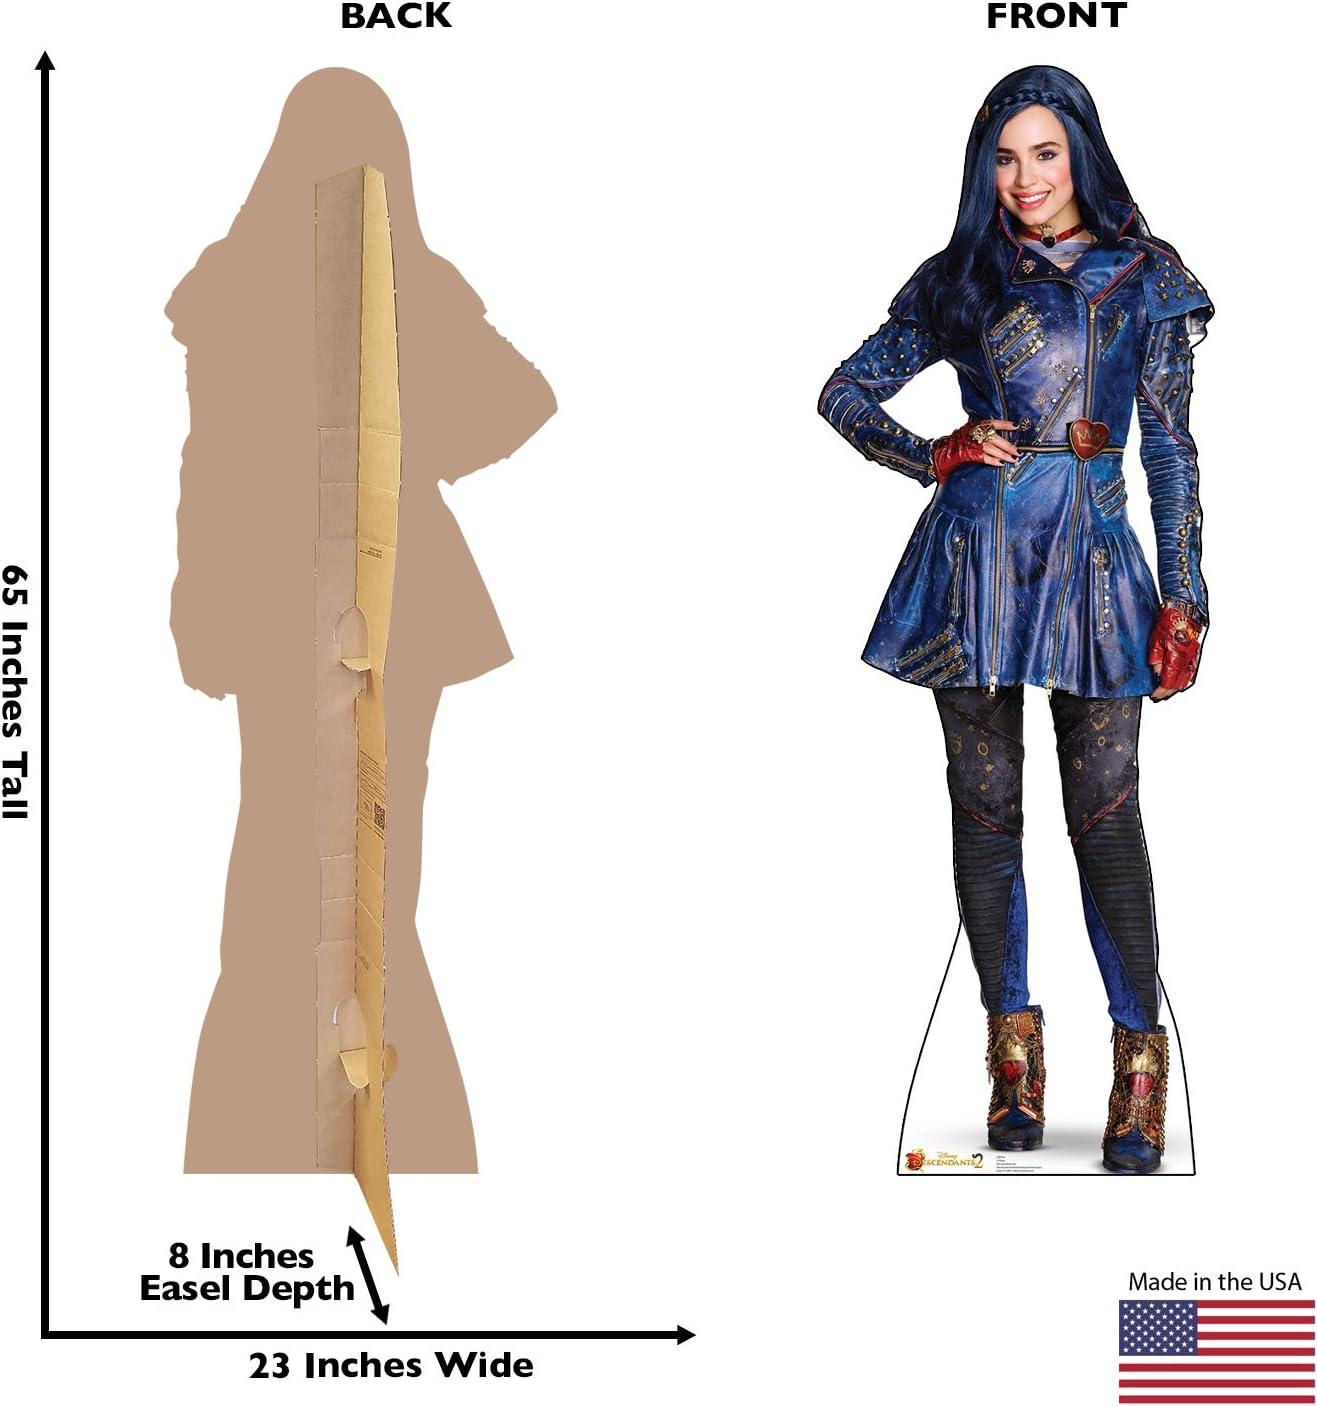 Disney Descendants 2 Advanced Graphics Evie Life Size Cardboard Cutout Standup